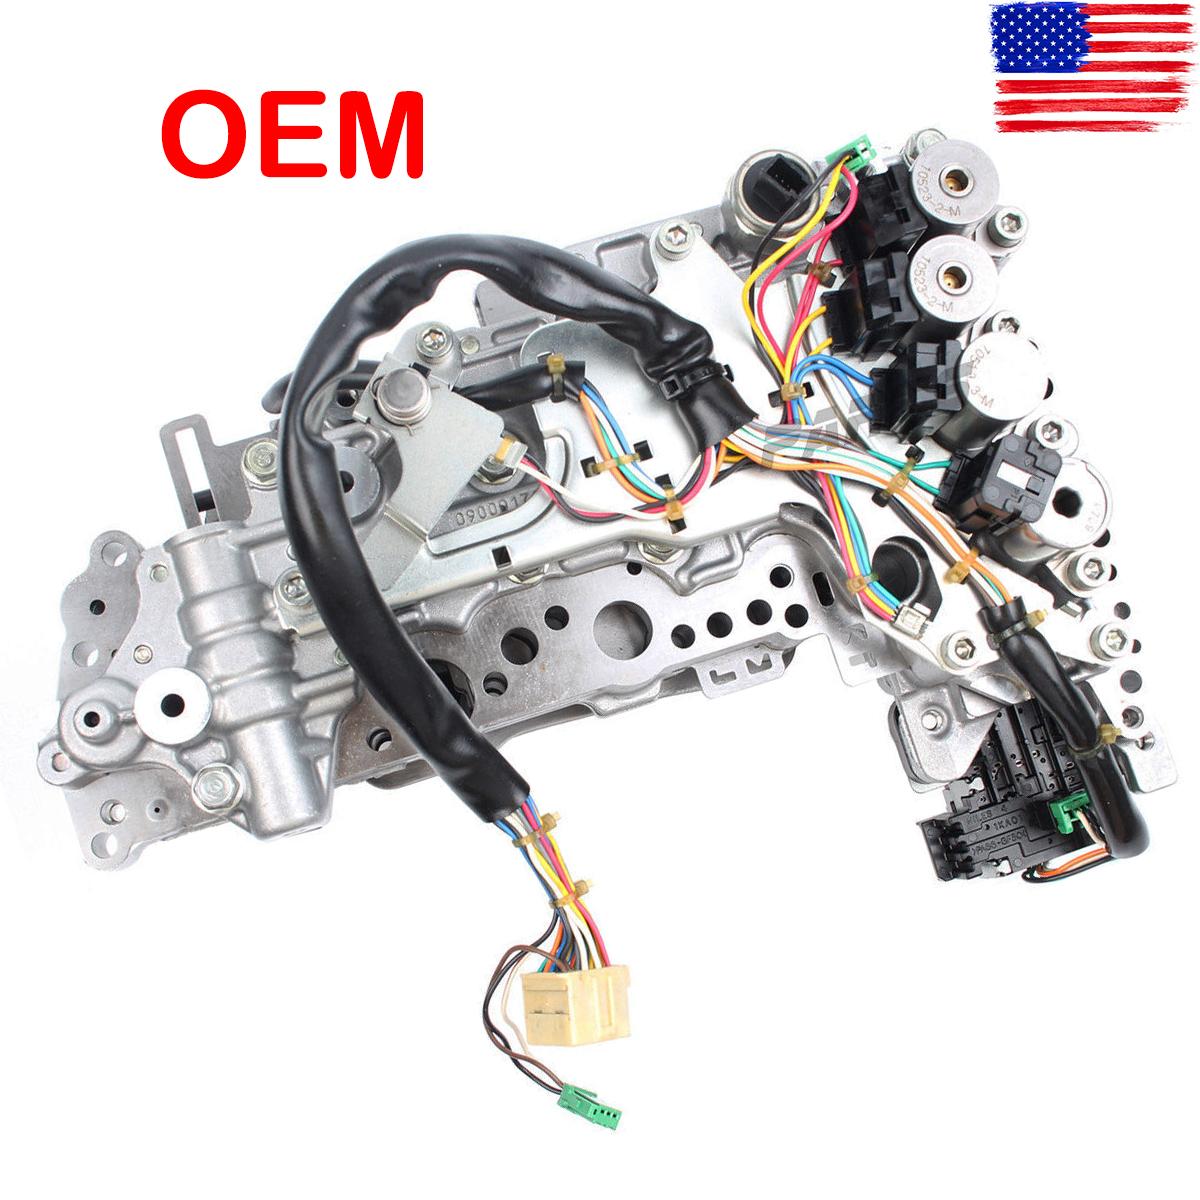 How to reprogram your transmission control module ebay oem cvt jf010e re0f09a transmission valve body nissan presage mitsubishi renault fandeluxe Images